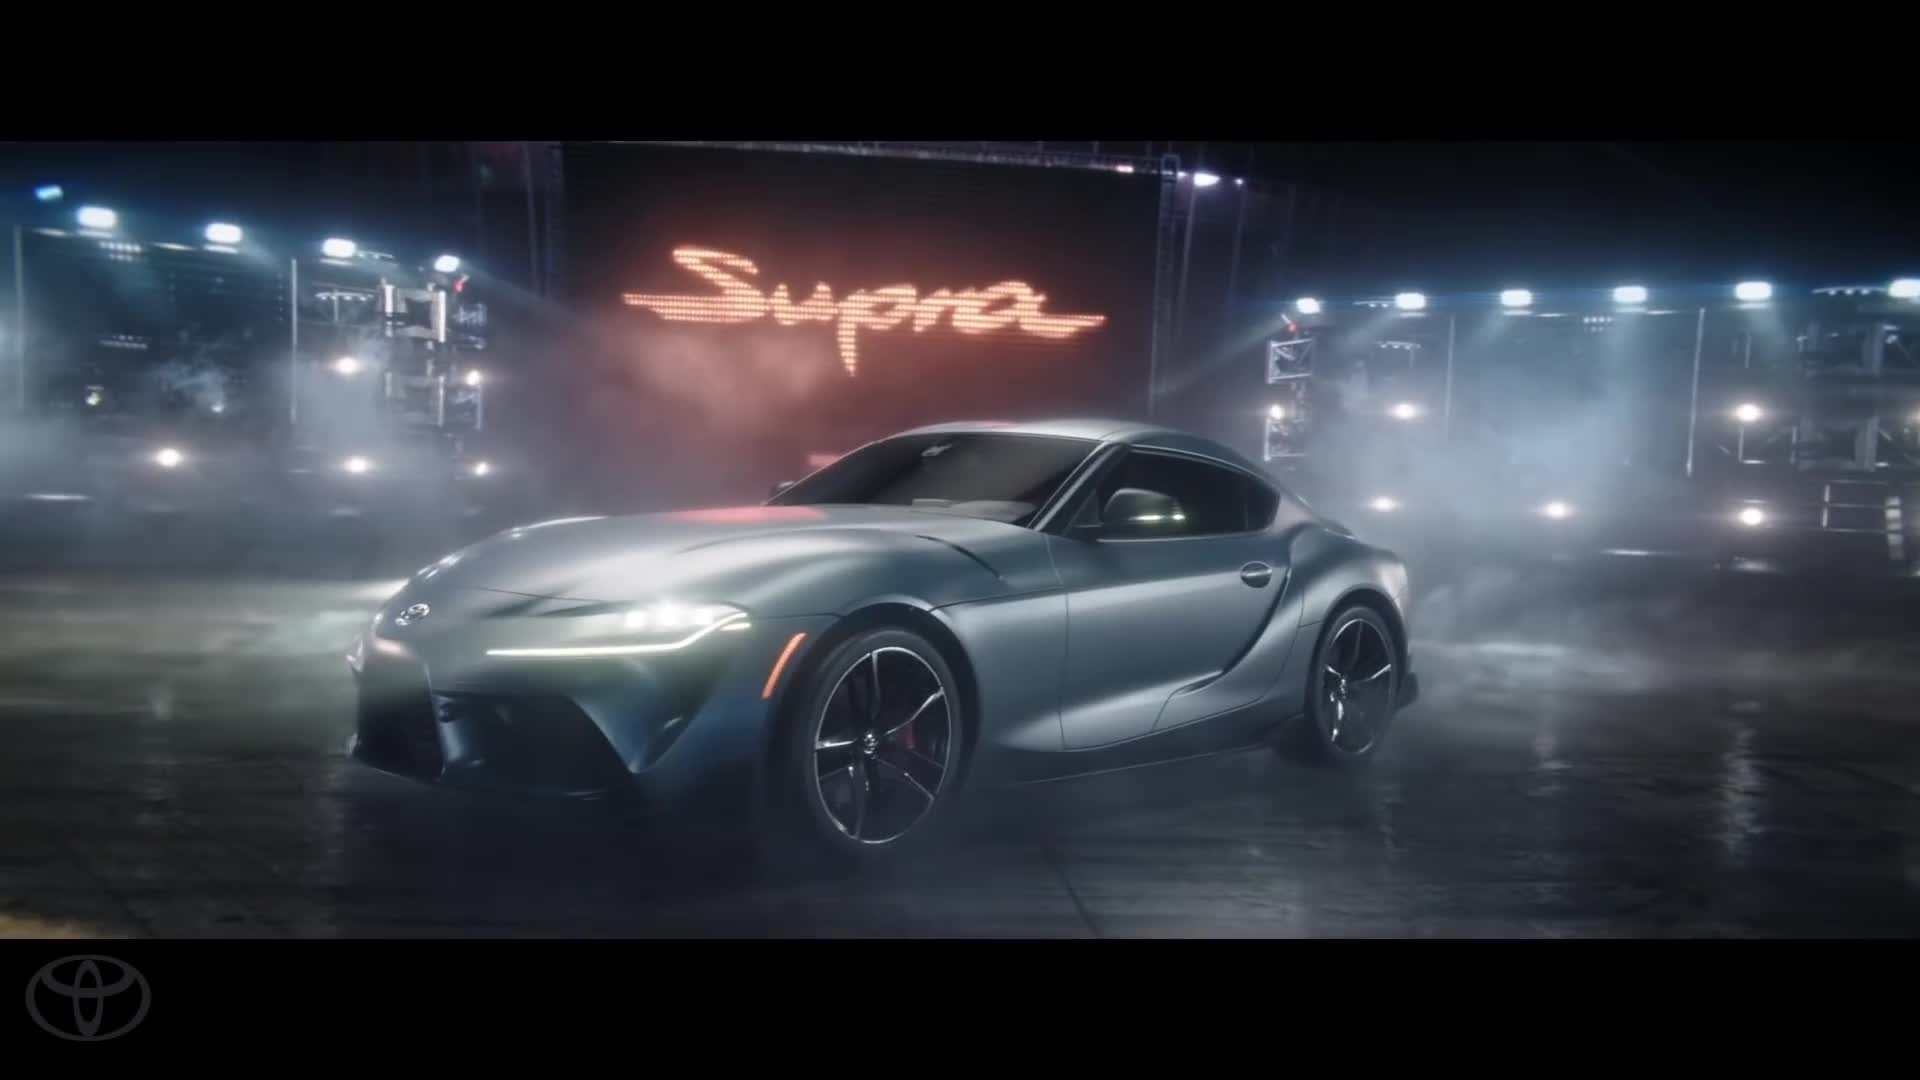 Werbespot, Super Bowl, Super Bowl 2019, Toyota, 2020 Toyota GR Supra